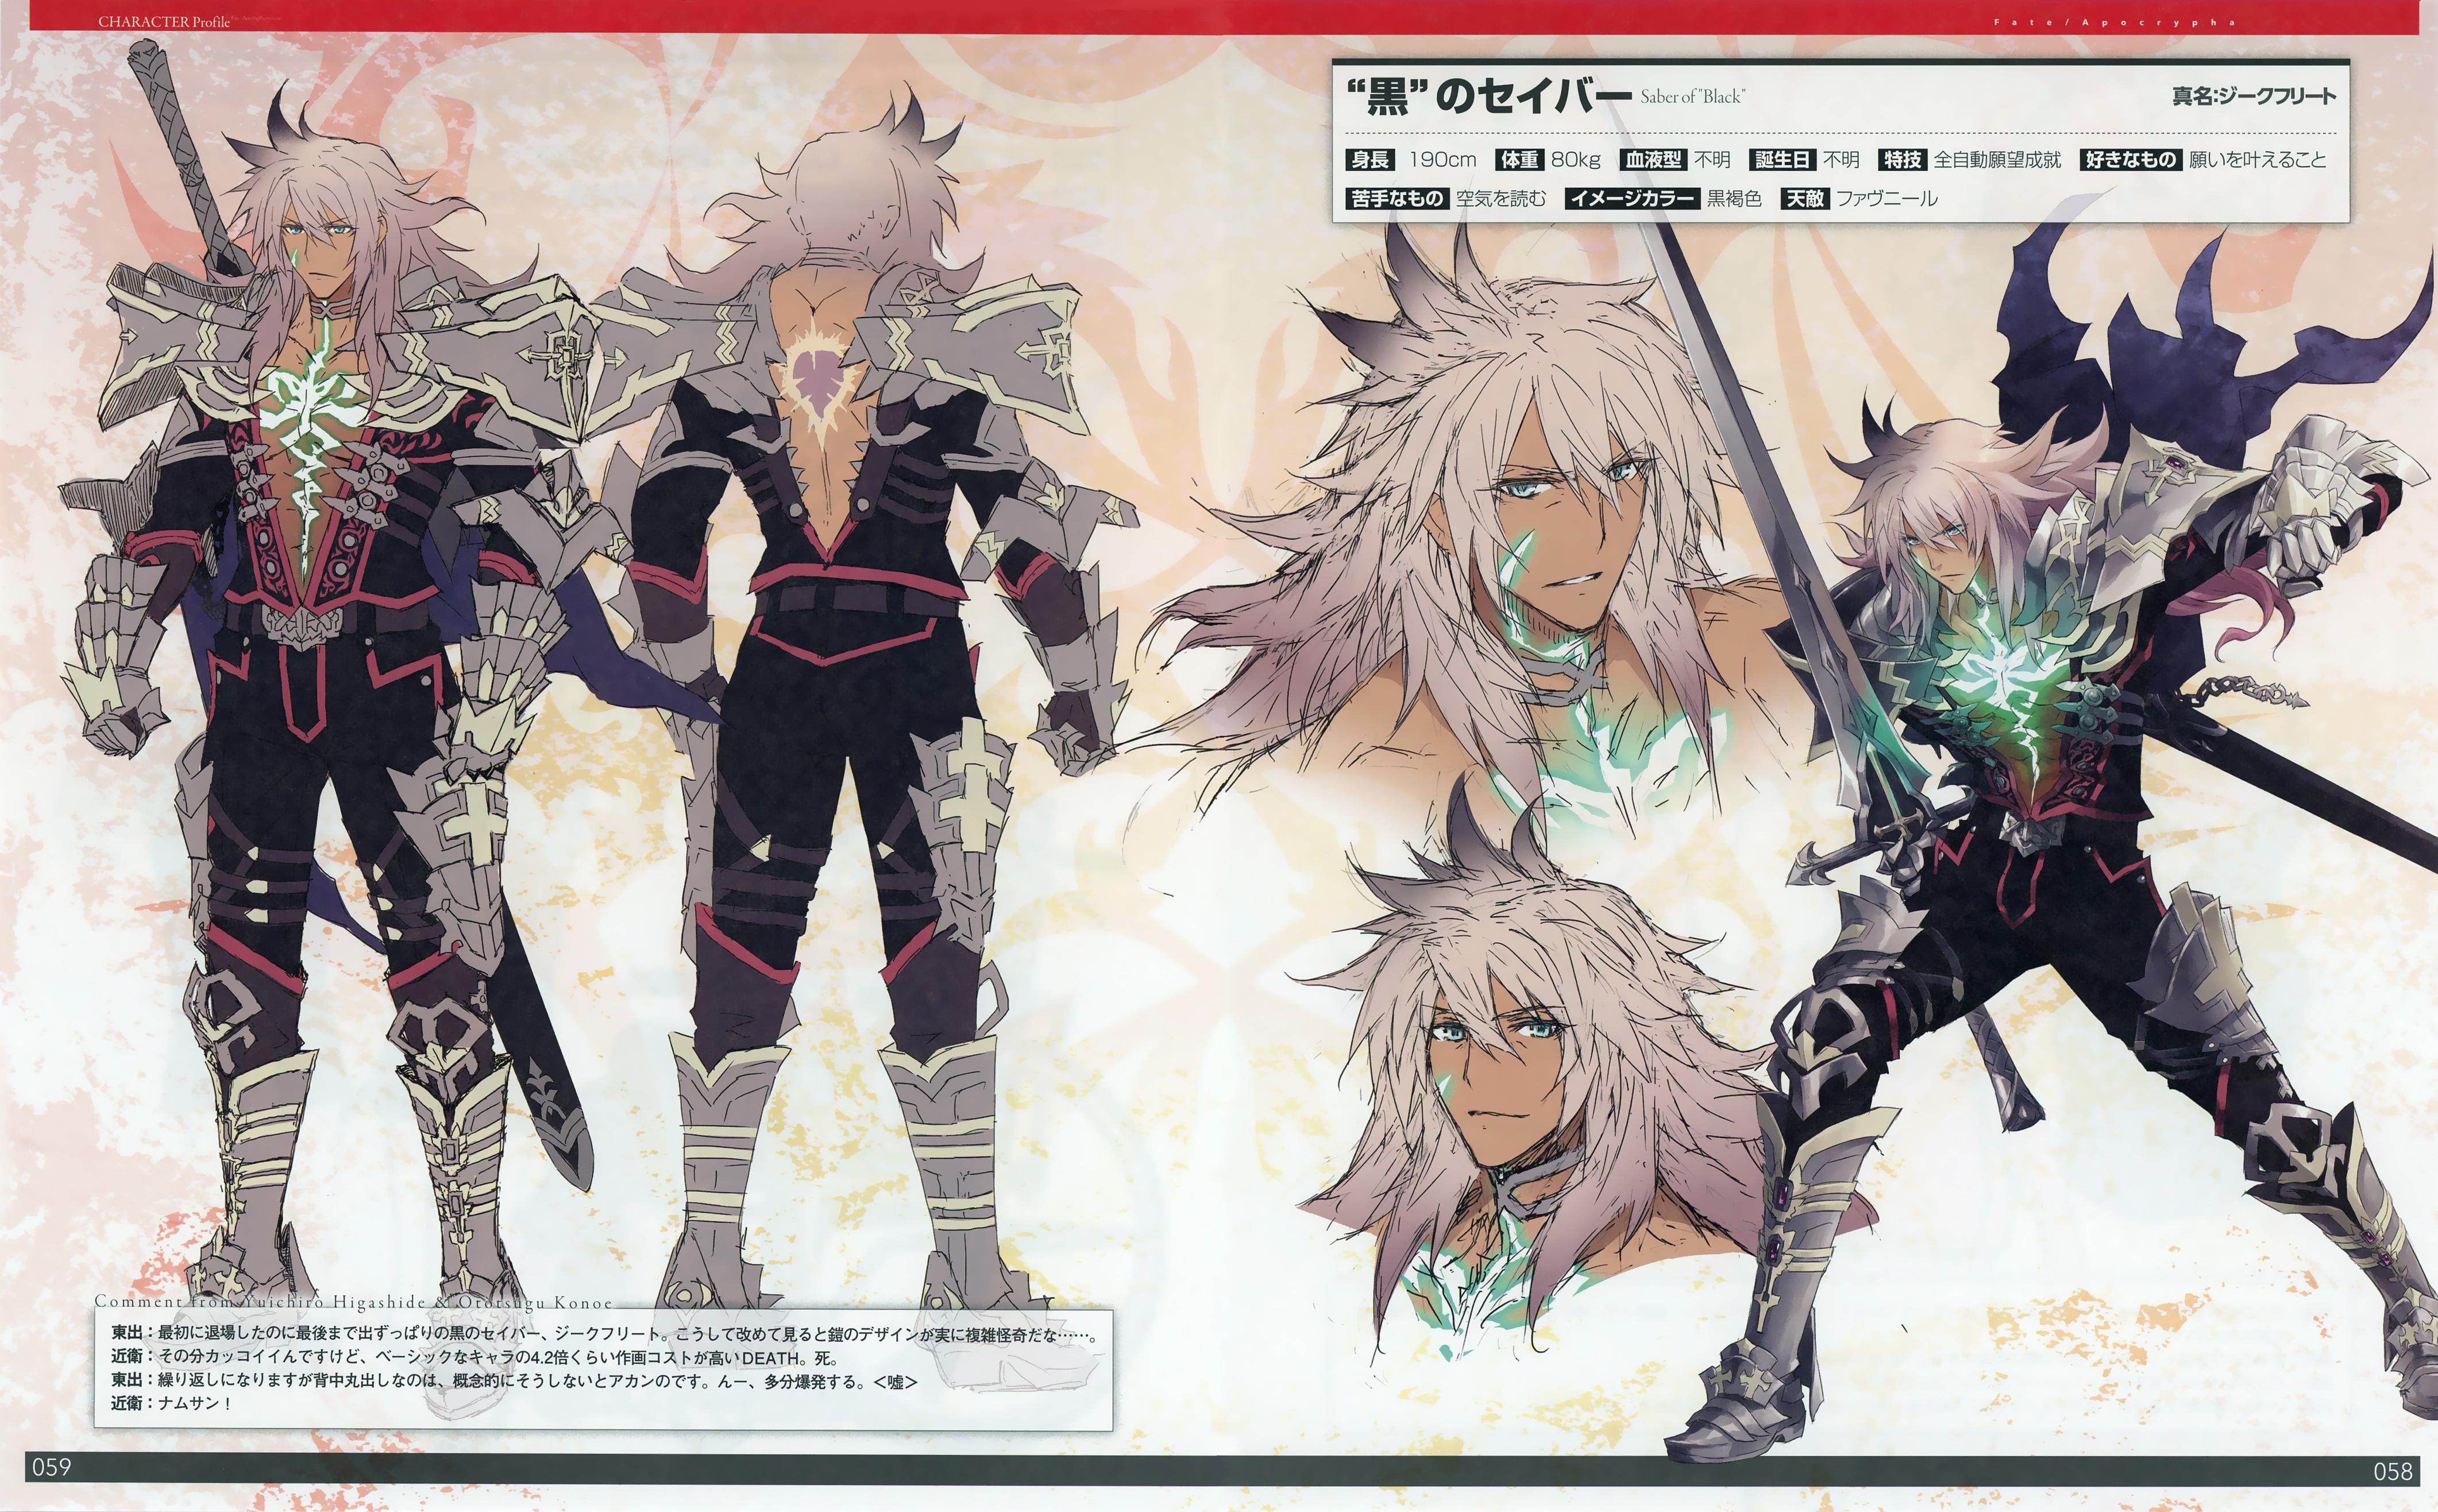 Black Saber Fate Apocrypha Zerochan Anime Image Board